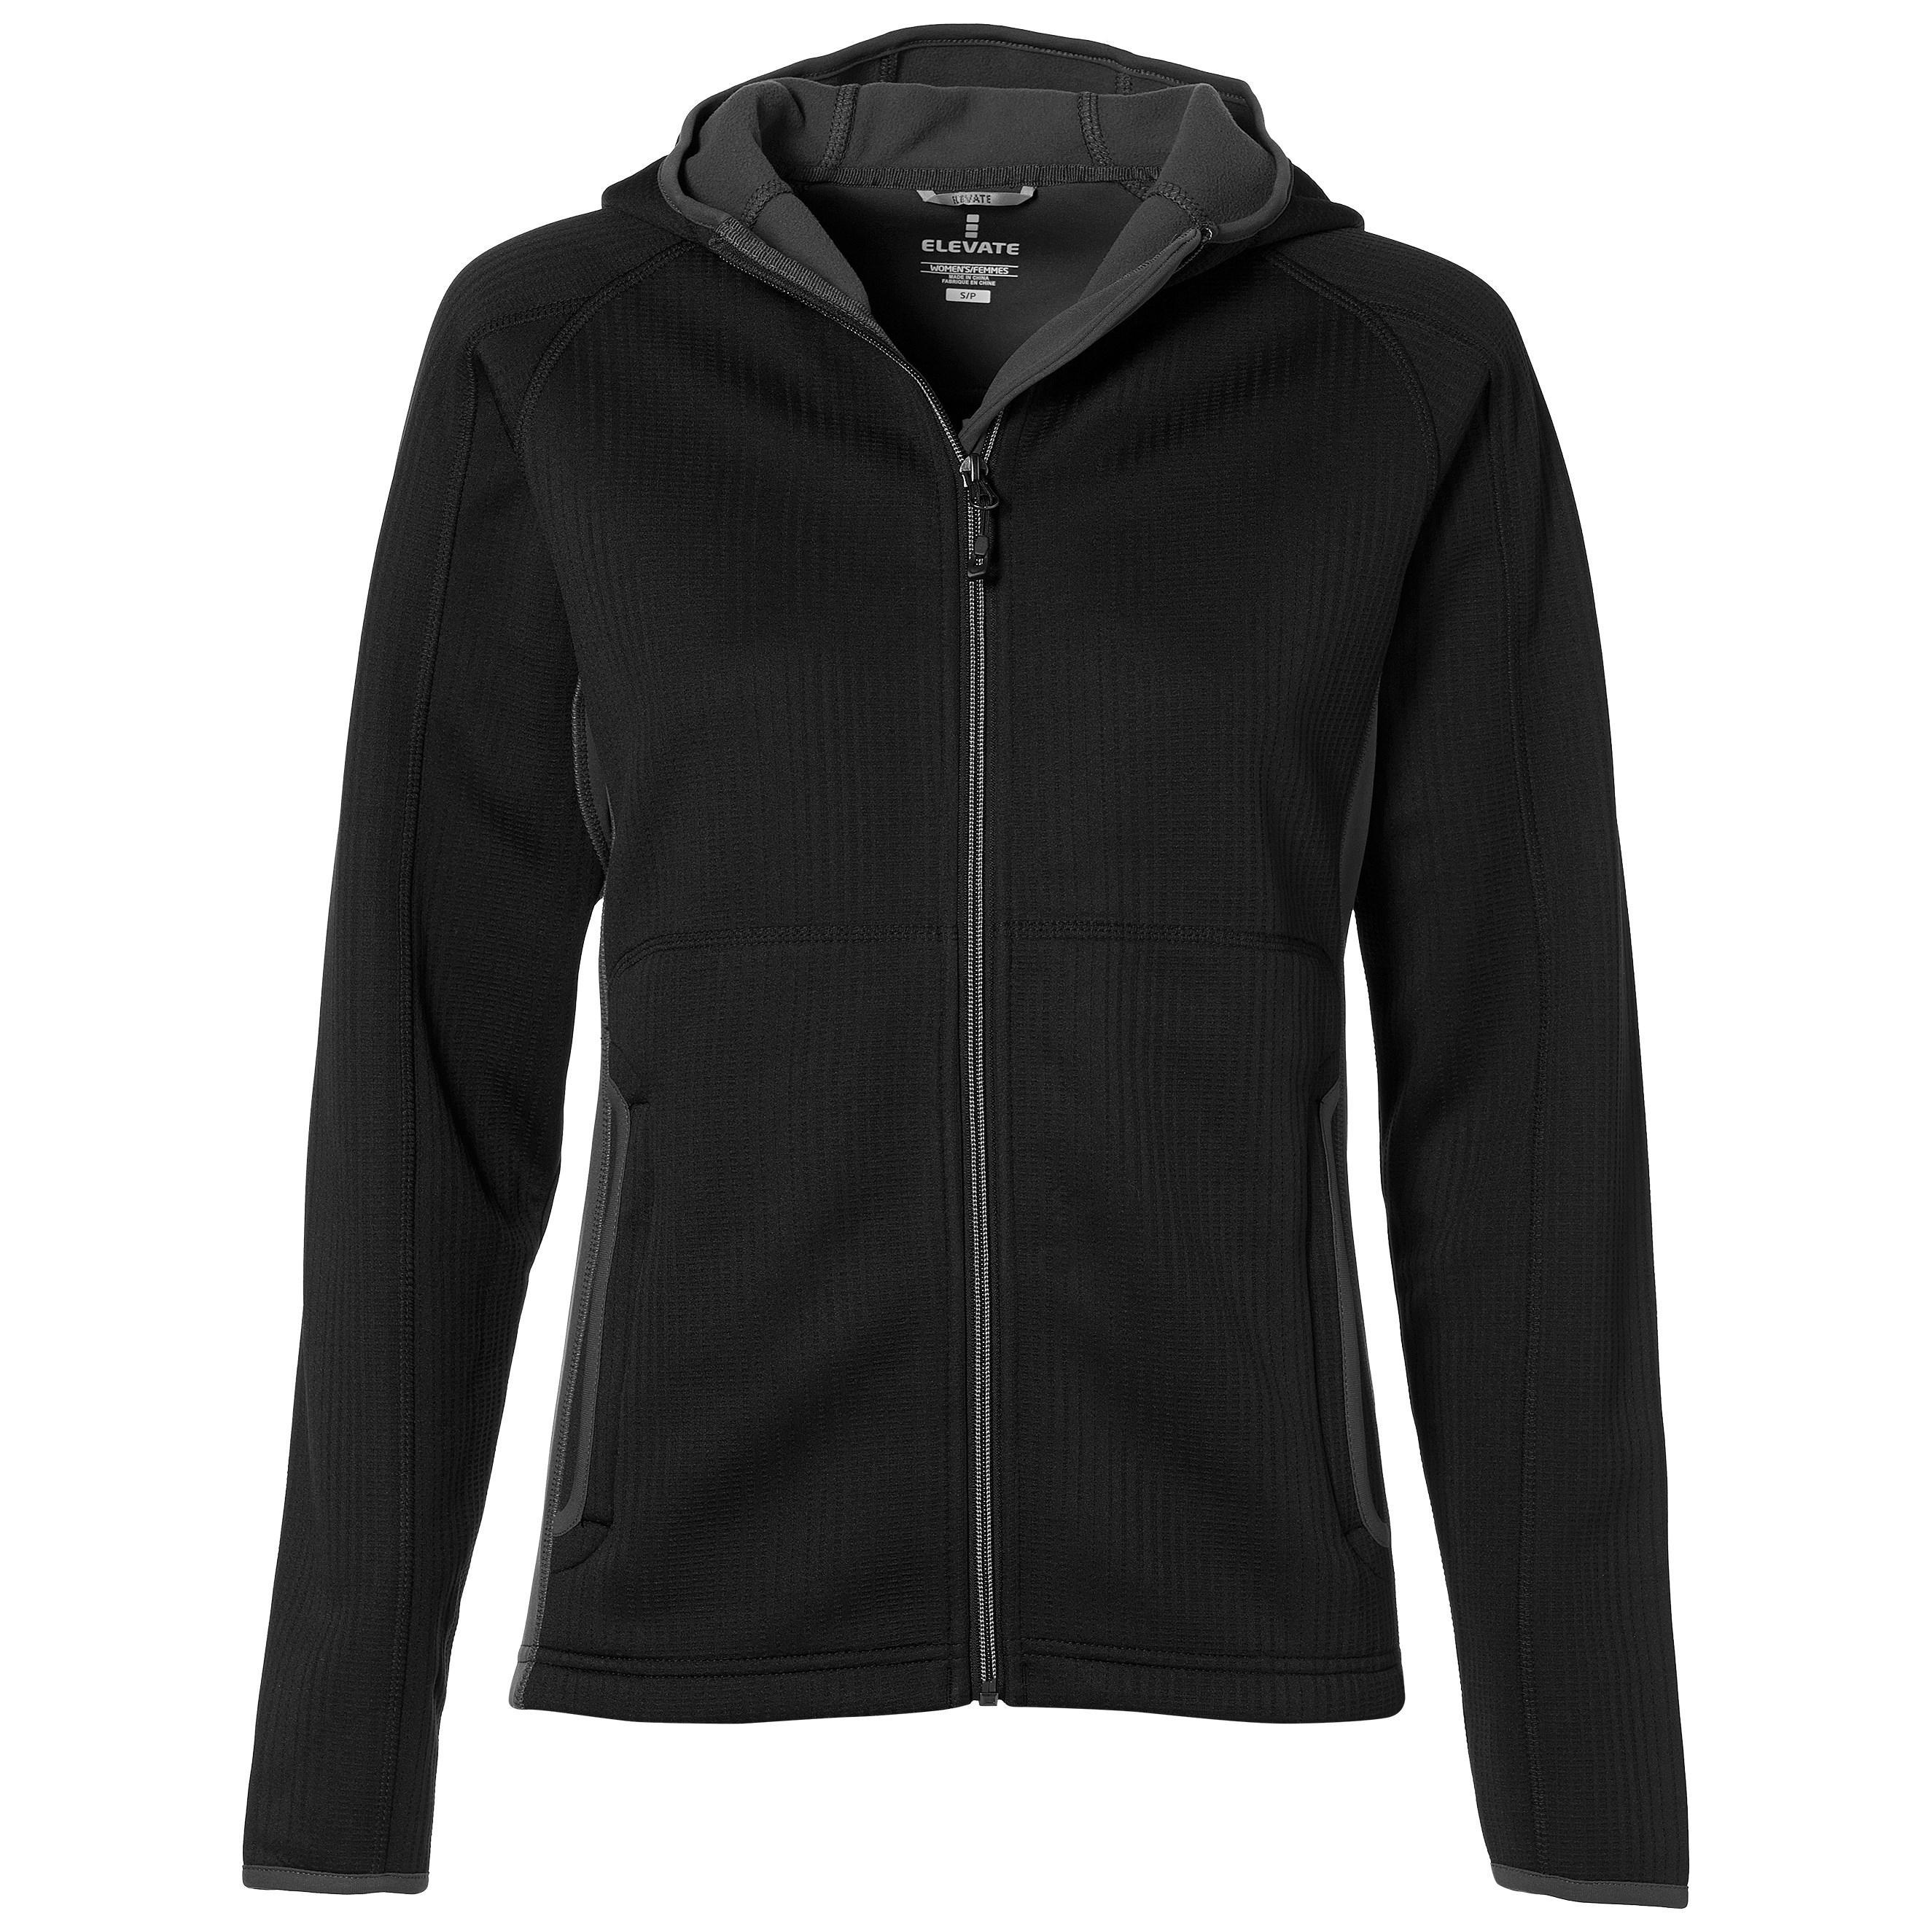 Ladies Ferno Bonded Knit Jacket - Black Only